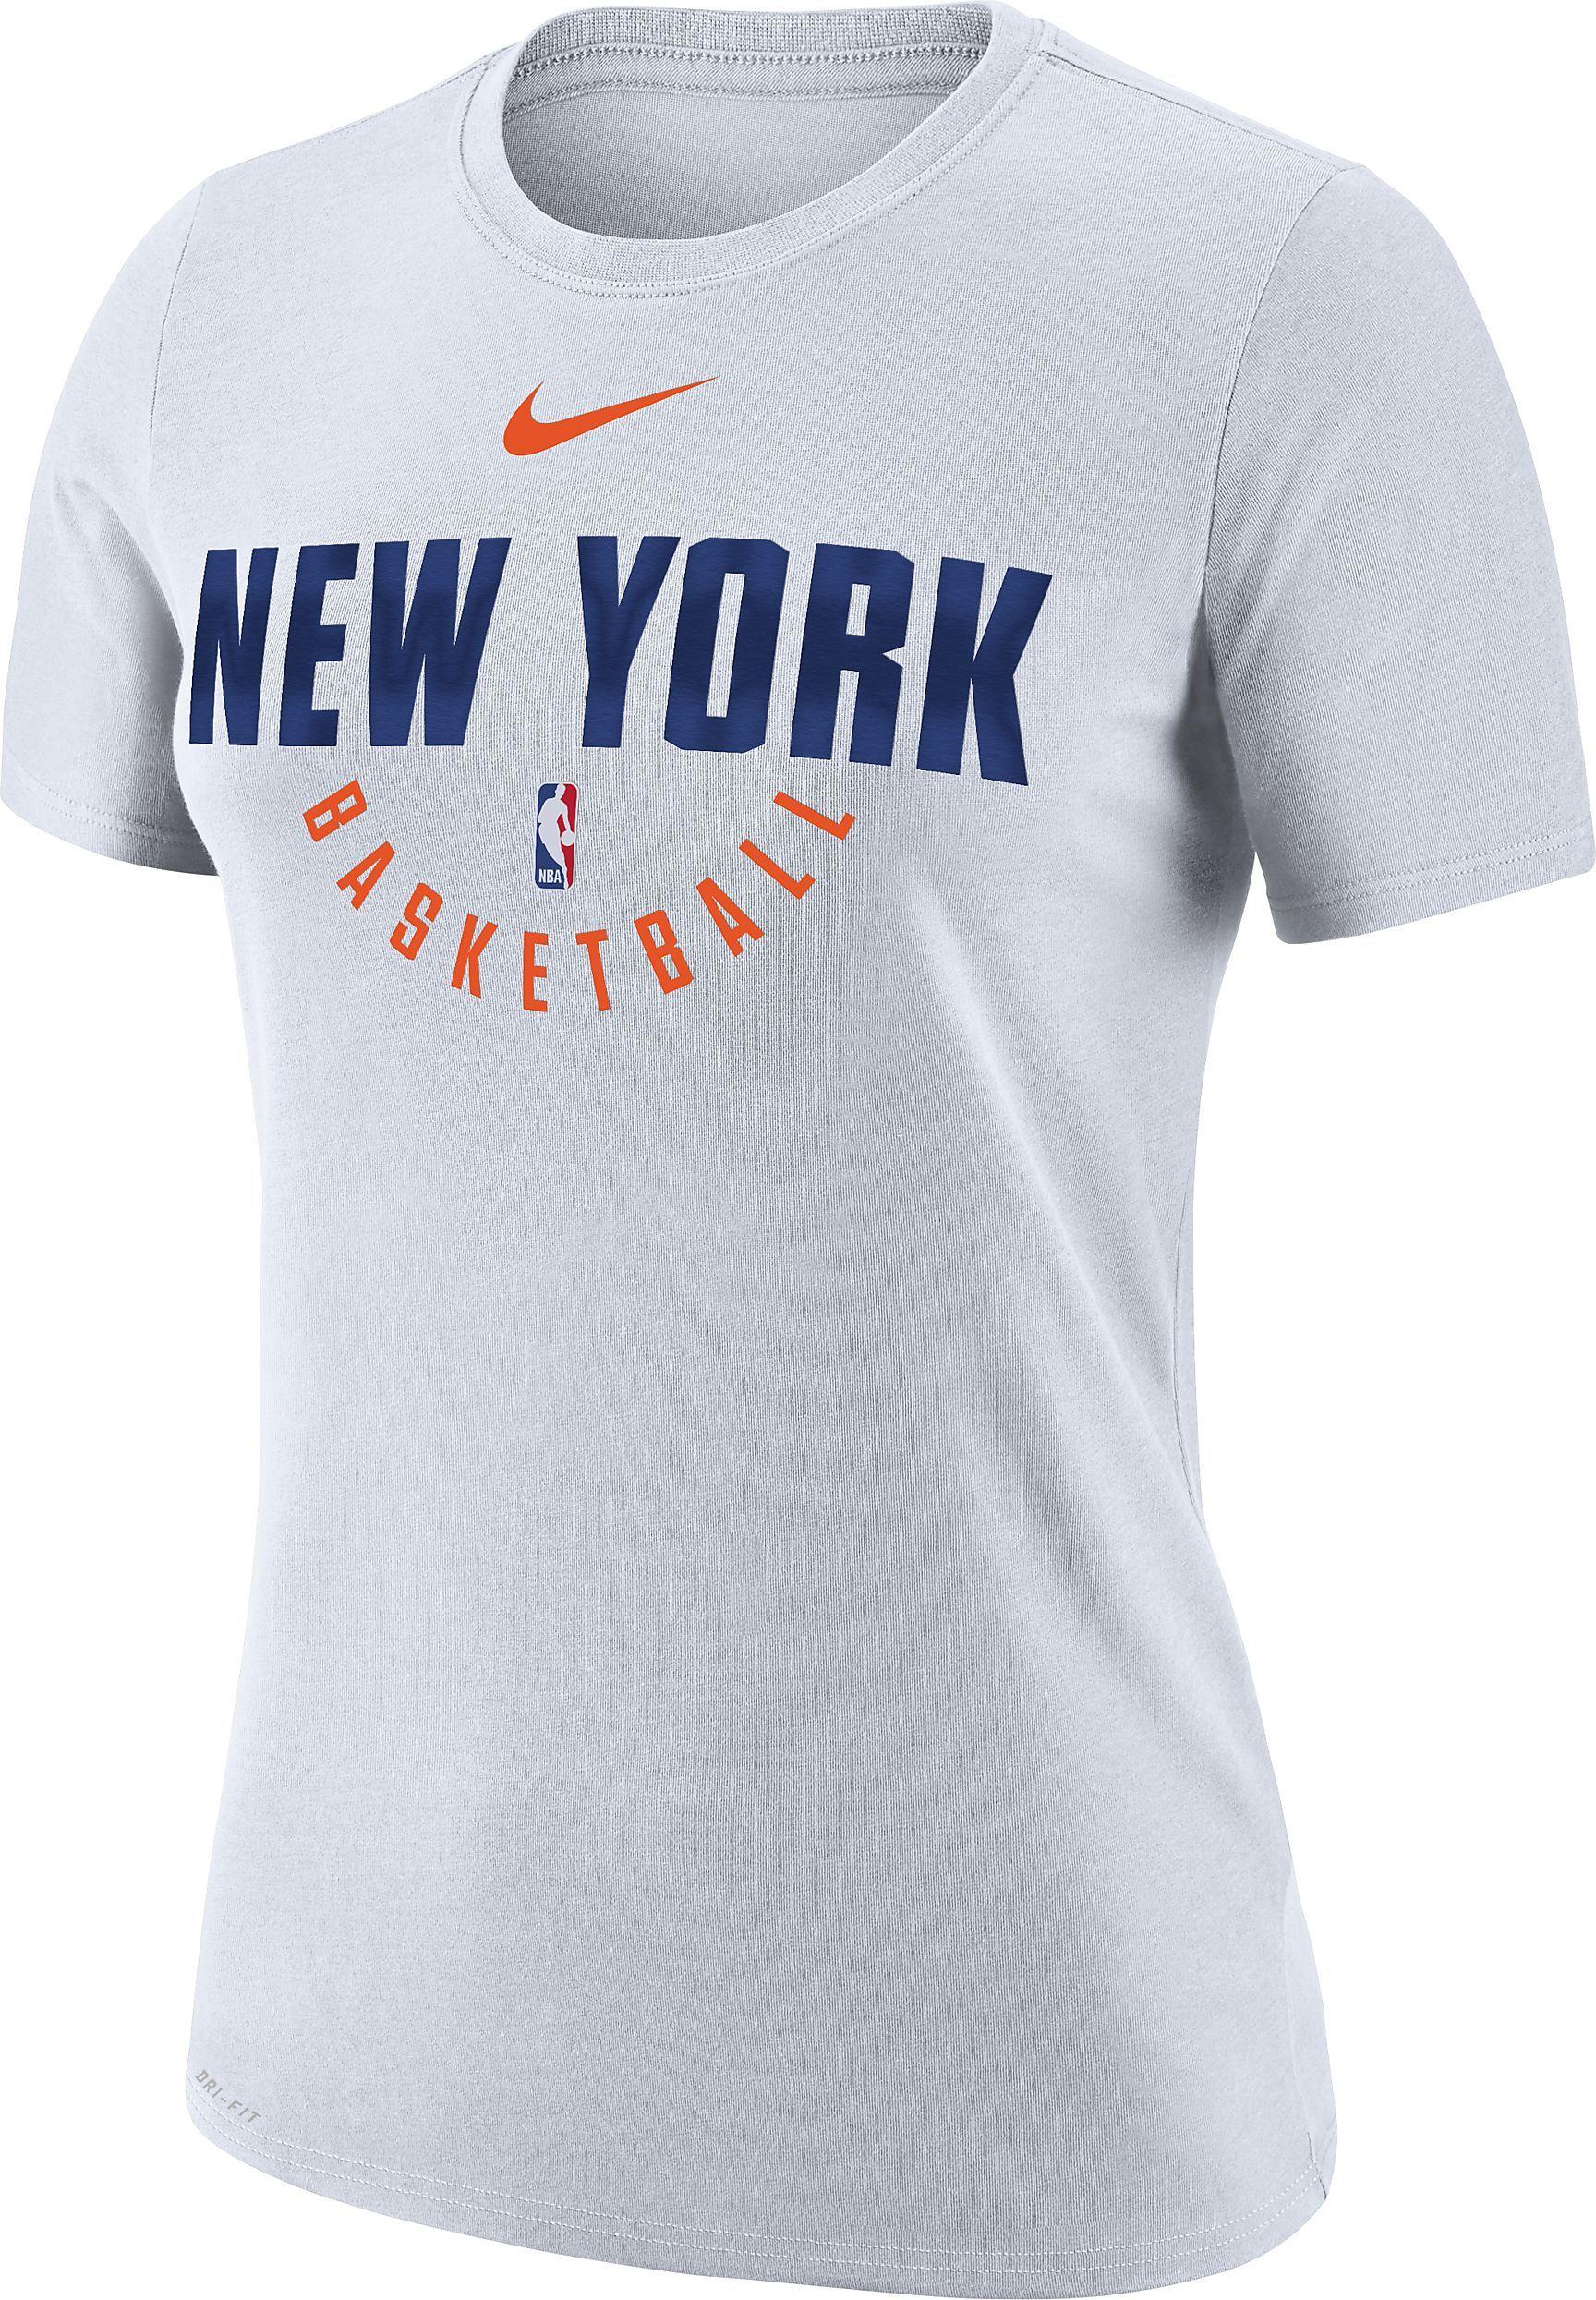 f6478006 New York Knicks Nike Dry Women's NBA T-Shirt | Nike, 'Just Do It ...